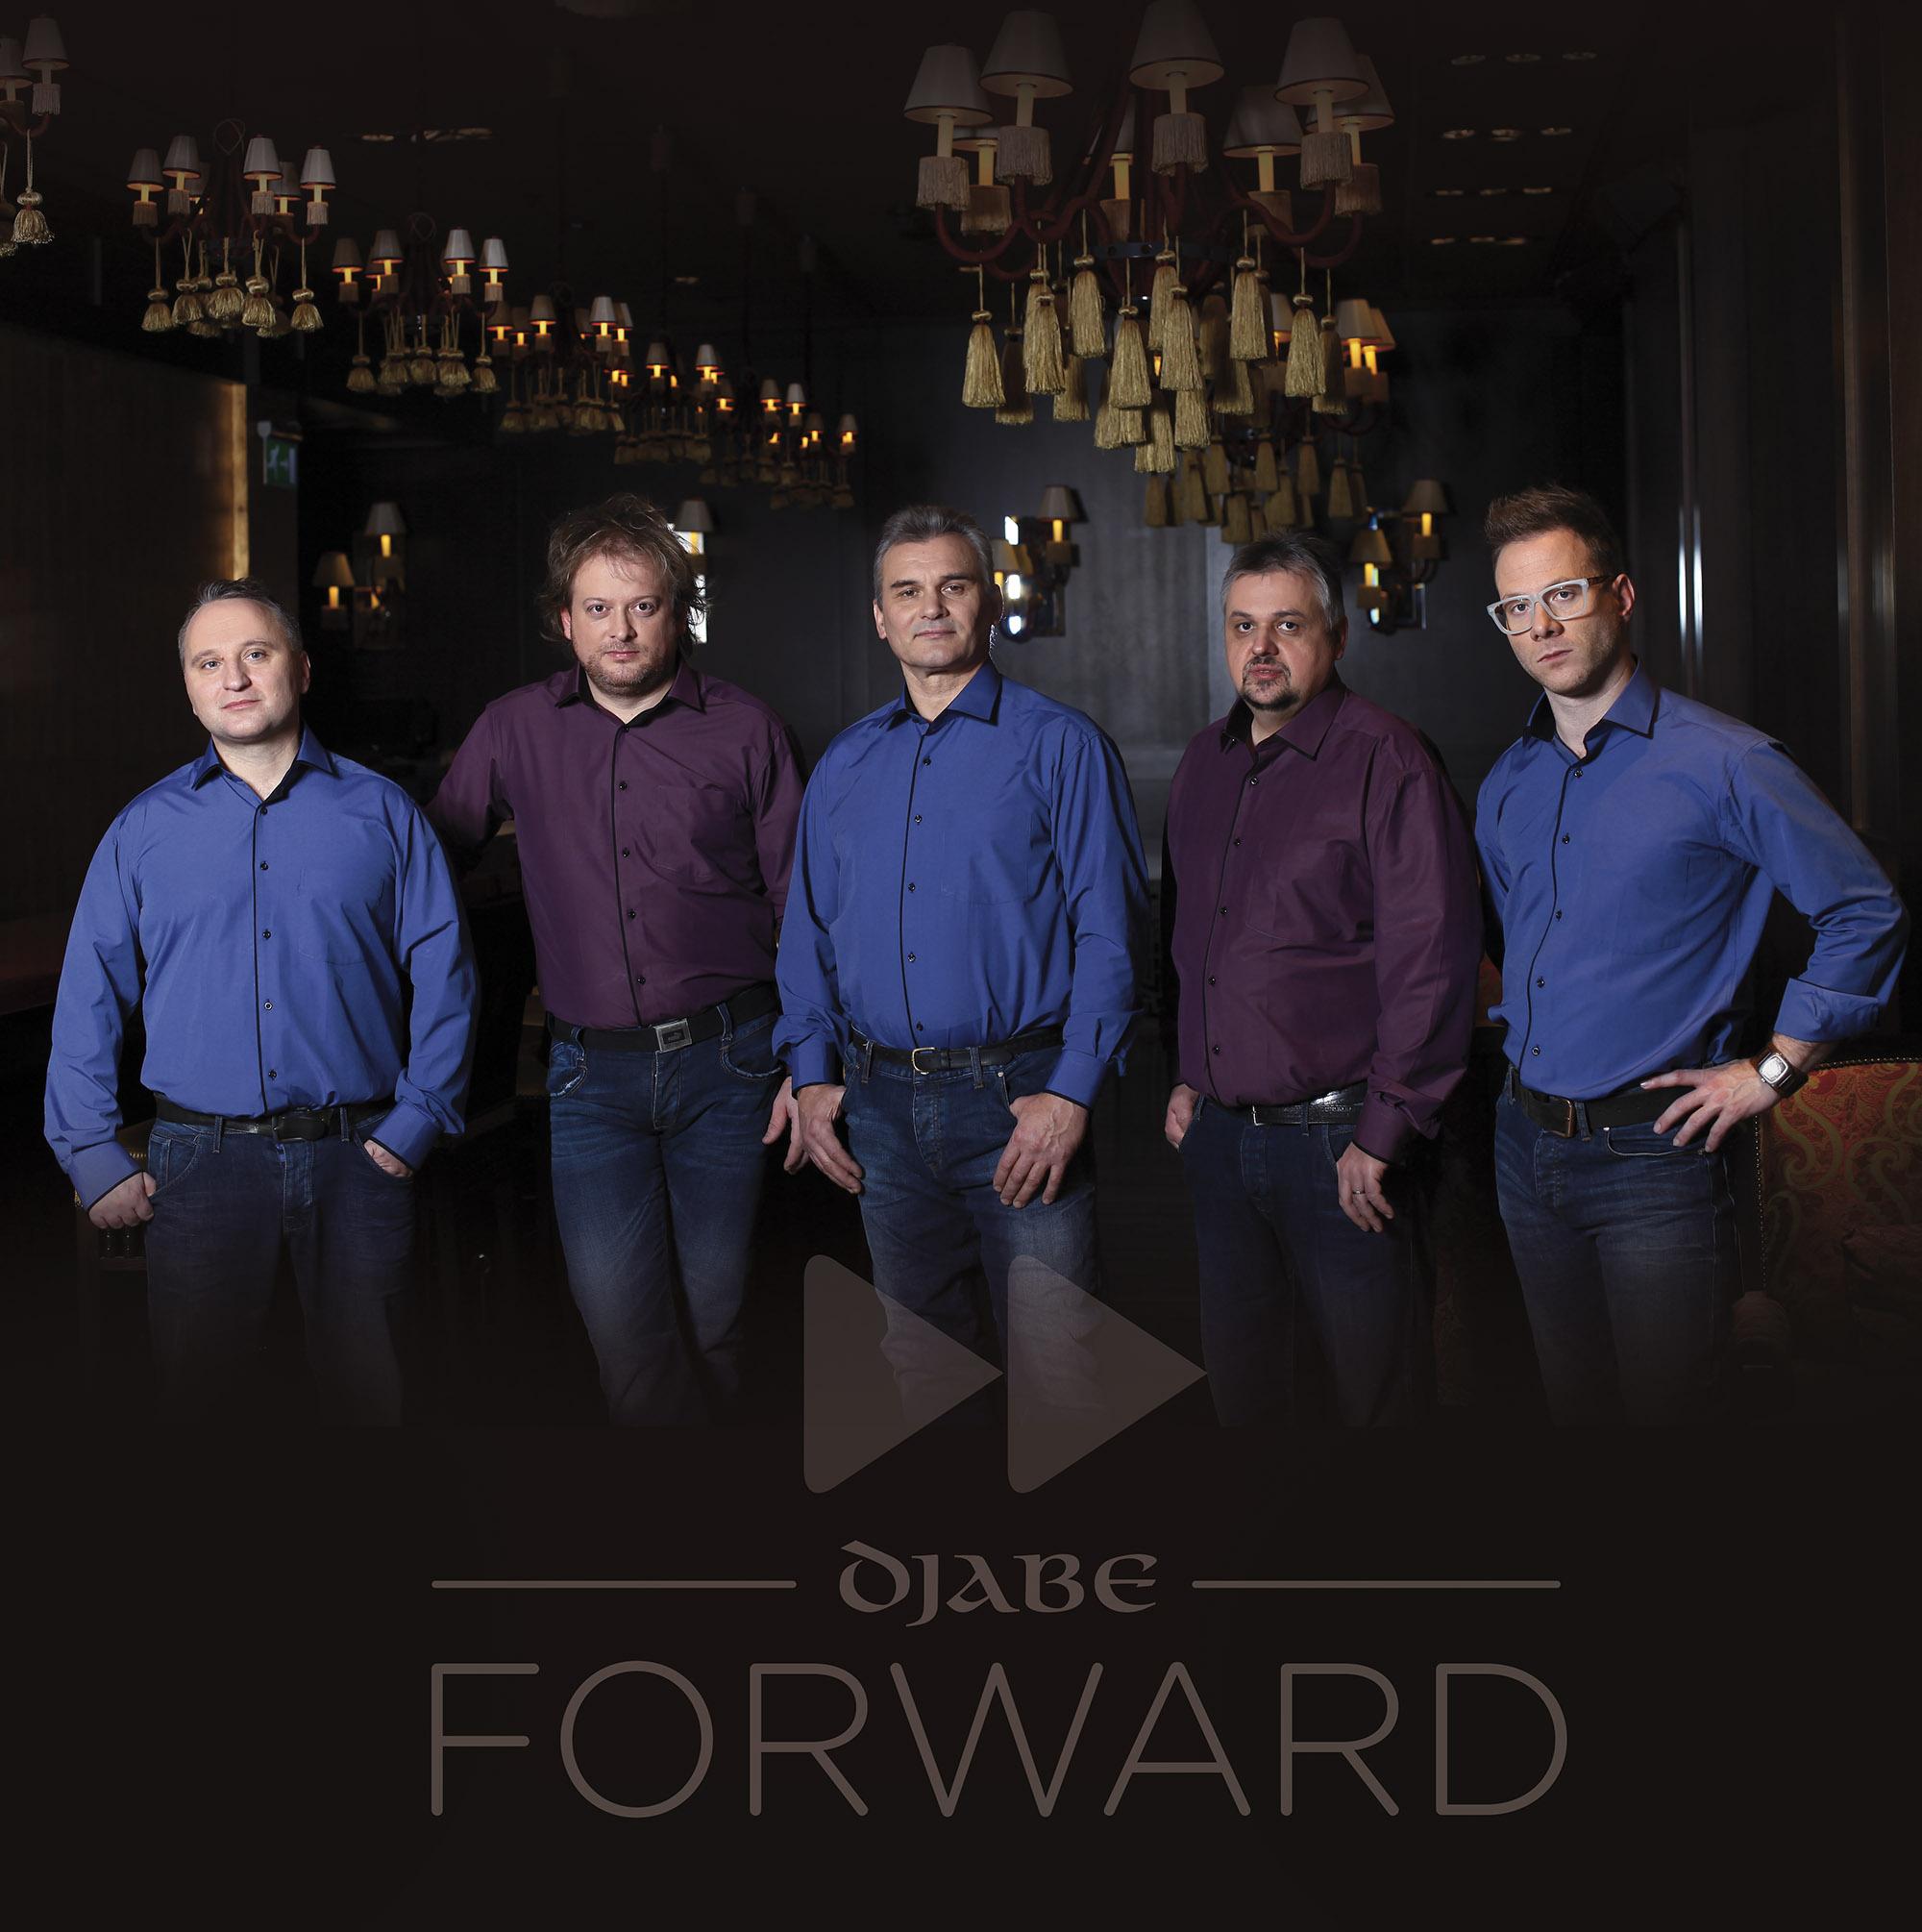 Djabe: Forward CD